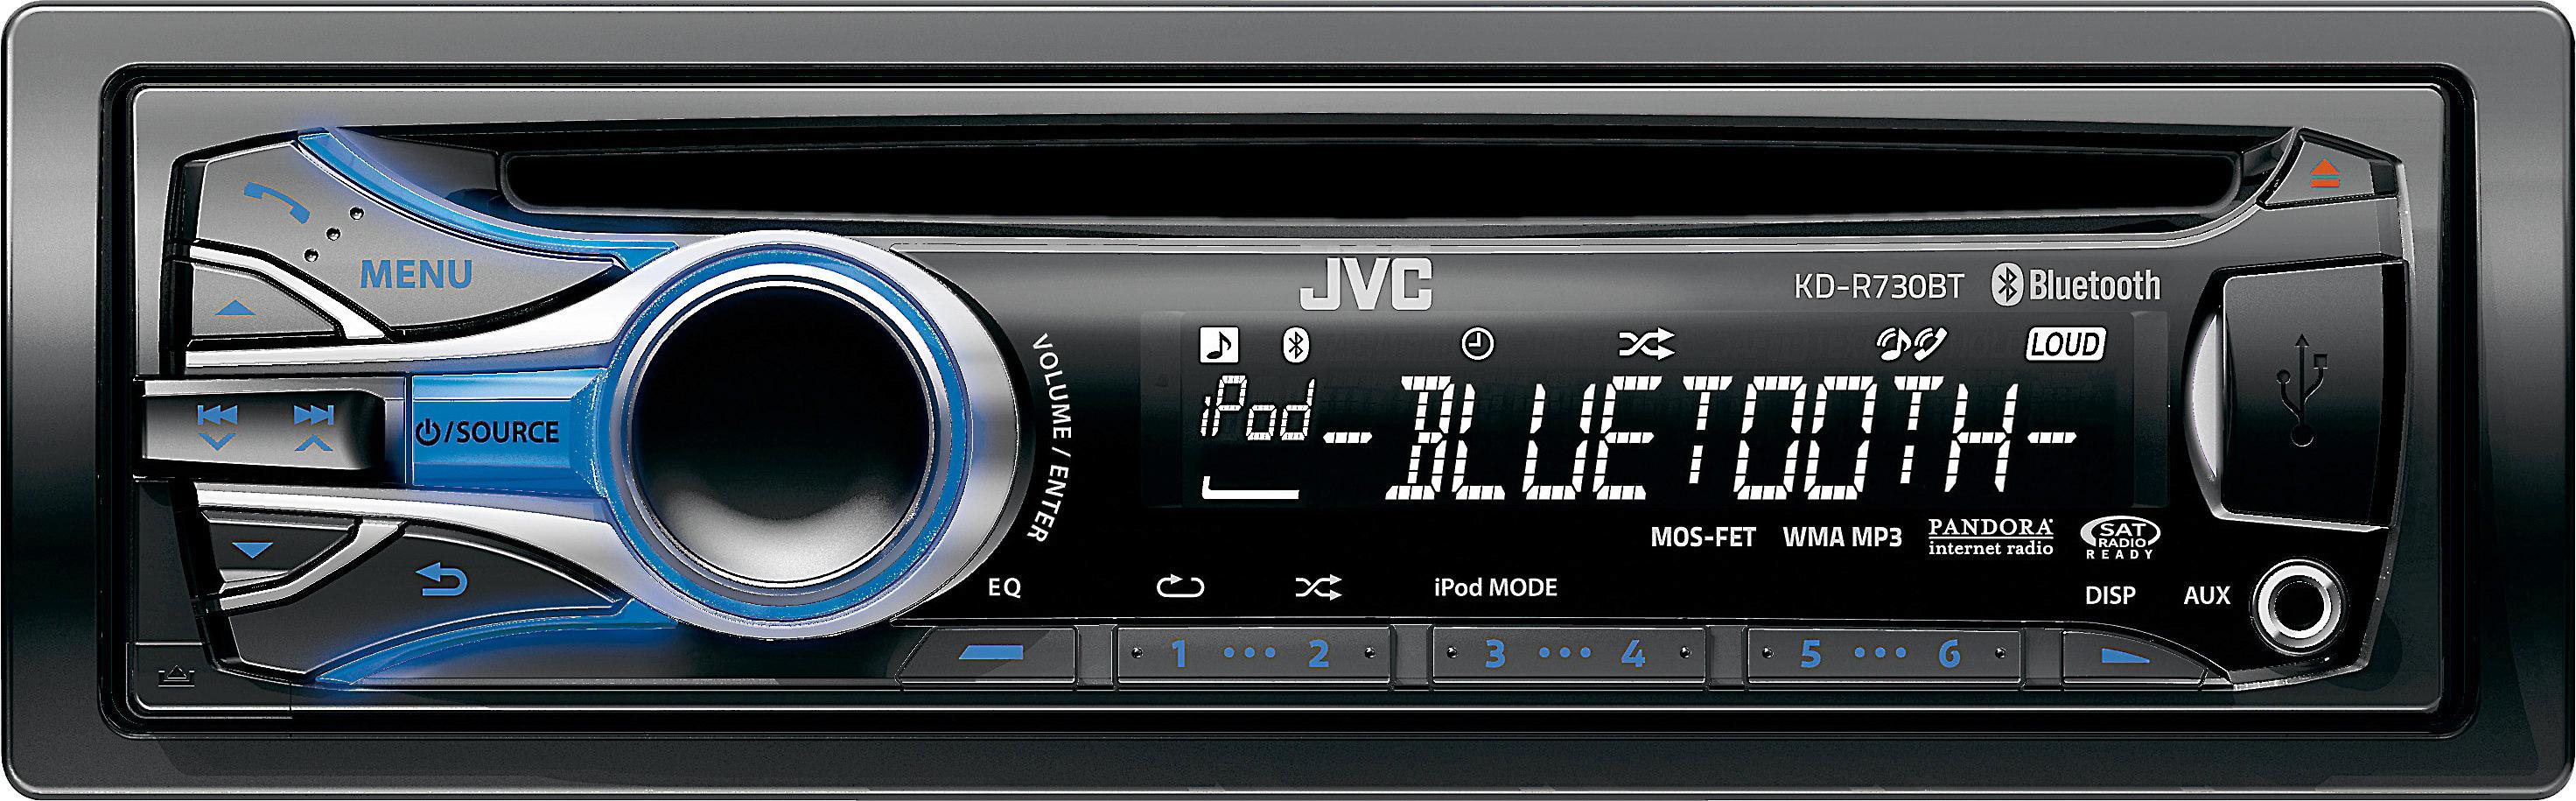 JVC KD-R730BT CD receiver at Crutchfield on jvc wiring harness, jvc speaker, jvc harness diagram, jvc kd r330 wiring, standard car stereo wire diagram, jvc user manual, sony stereo wire harness diagram, jvc dvd car stereo wiring, jvc kd r200 wire diagram, jvc kd s29 wiring,